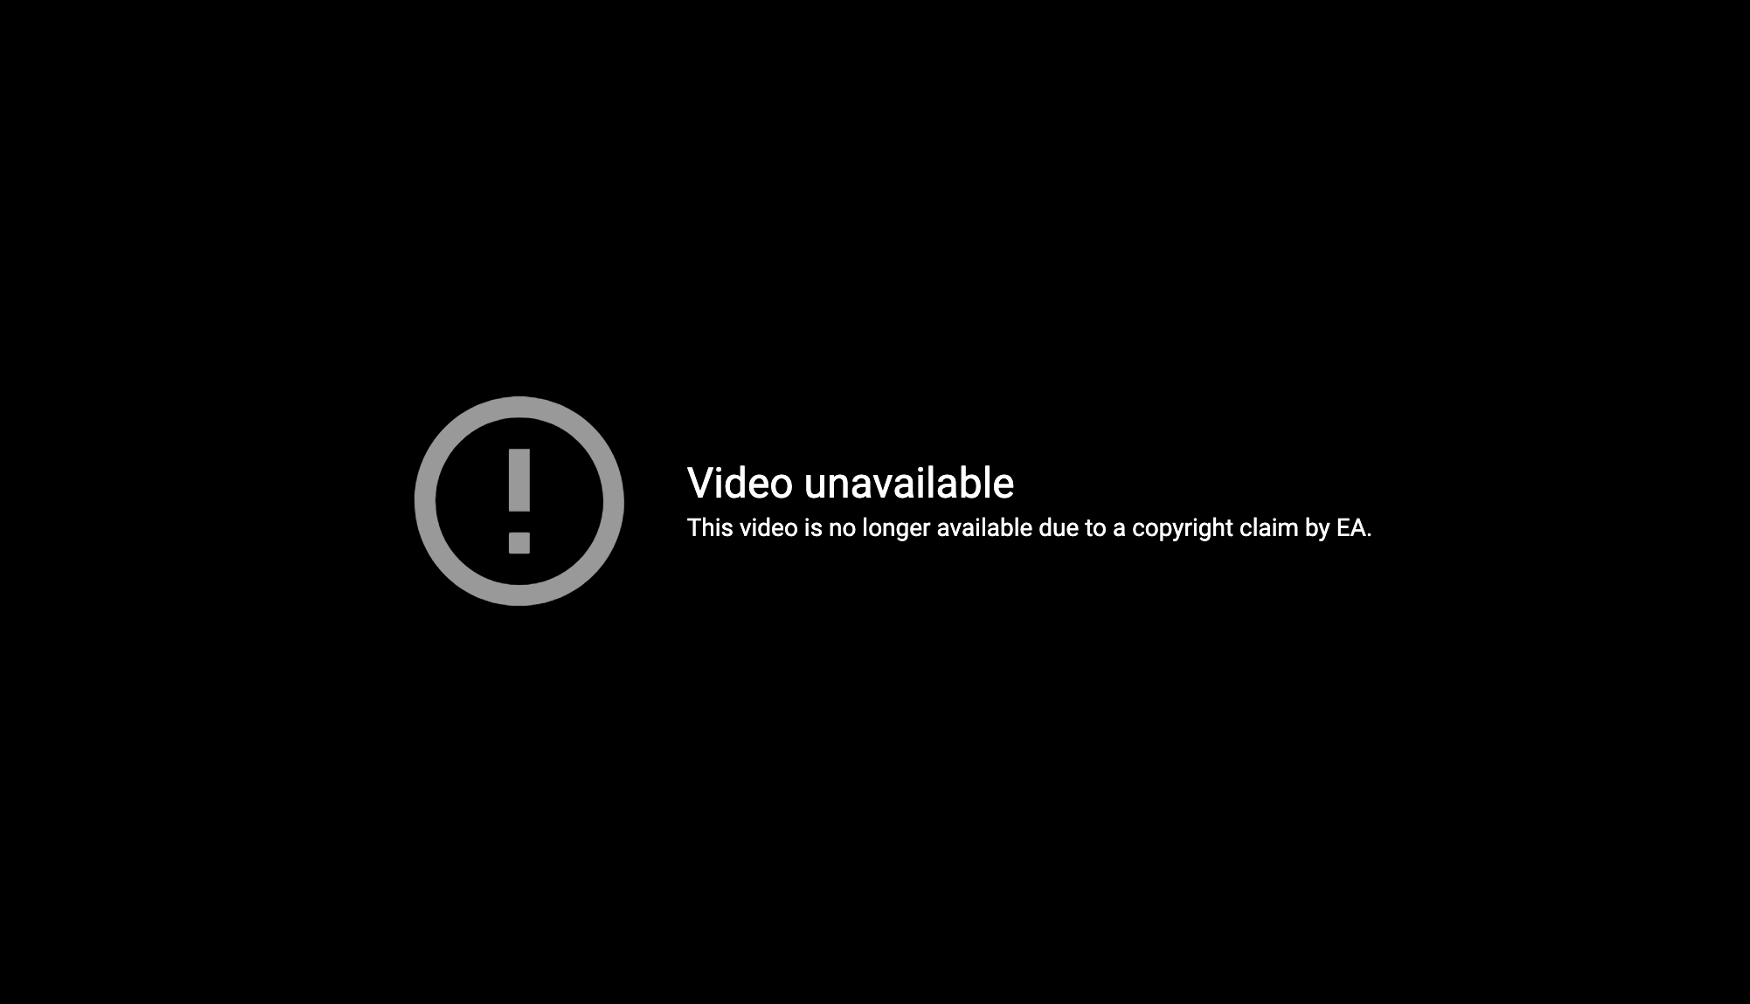 EA copyright striking FIFA leaks on YouTube